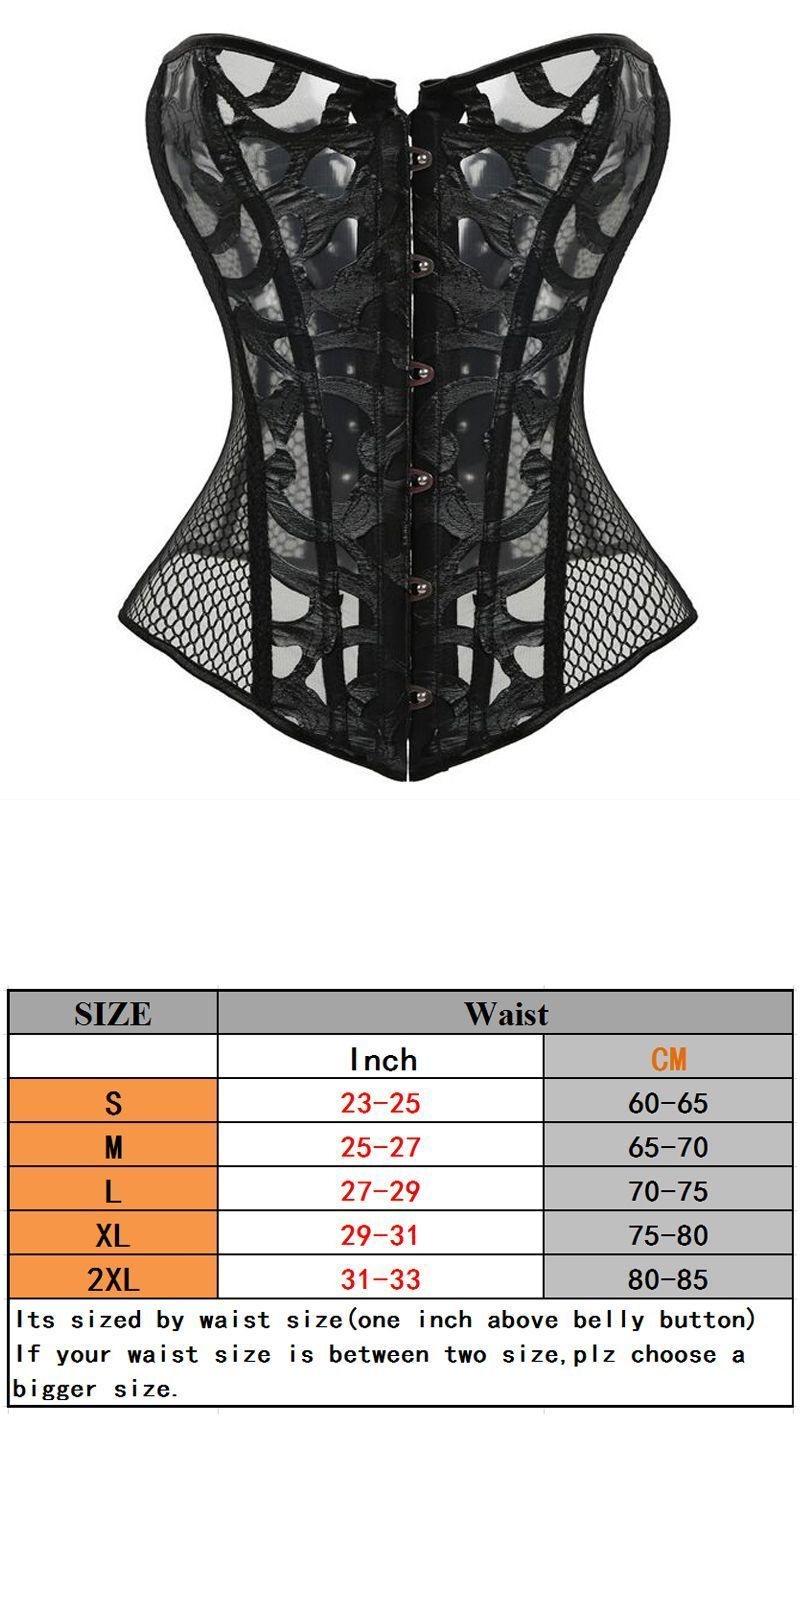 691082e25ac Newest hot mesh corset boned black bustier top women summer slimming overbust  sexy transparent see trough waist trainer corset  women  bustiers      corsets ...